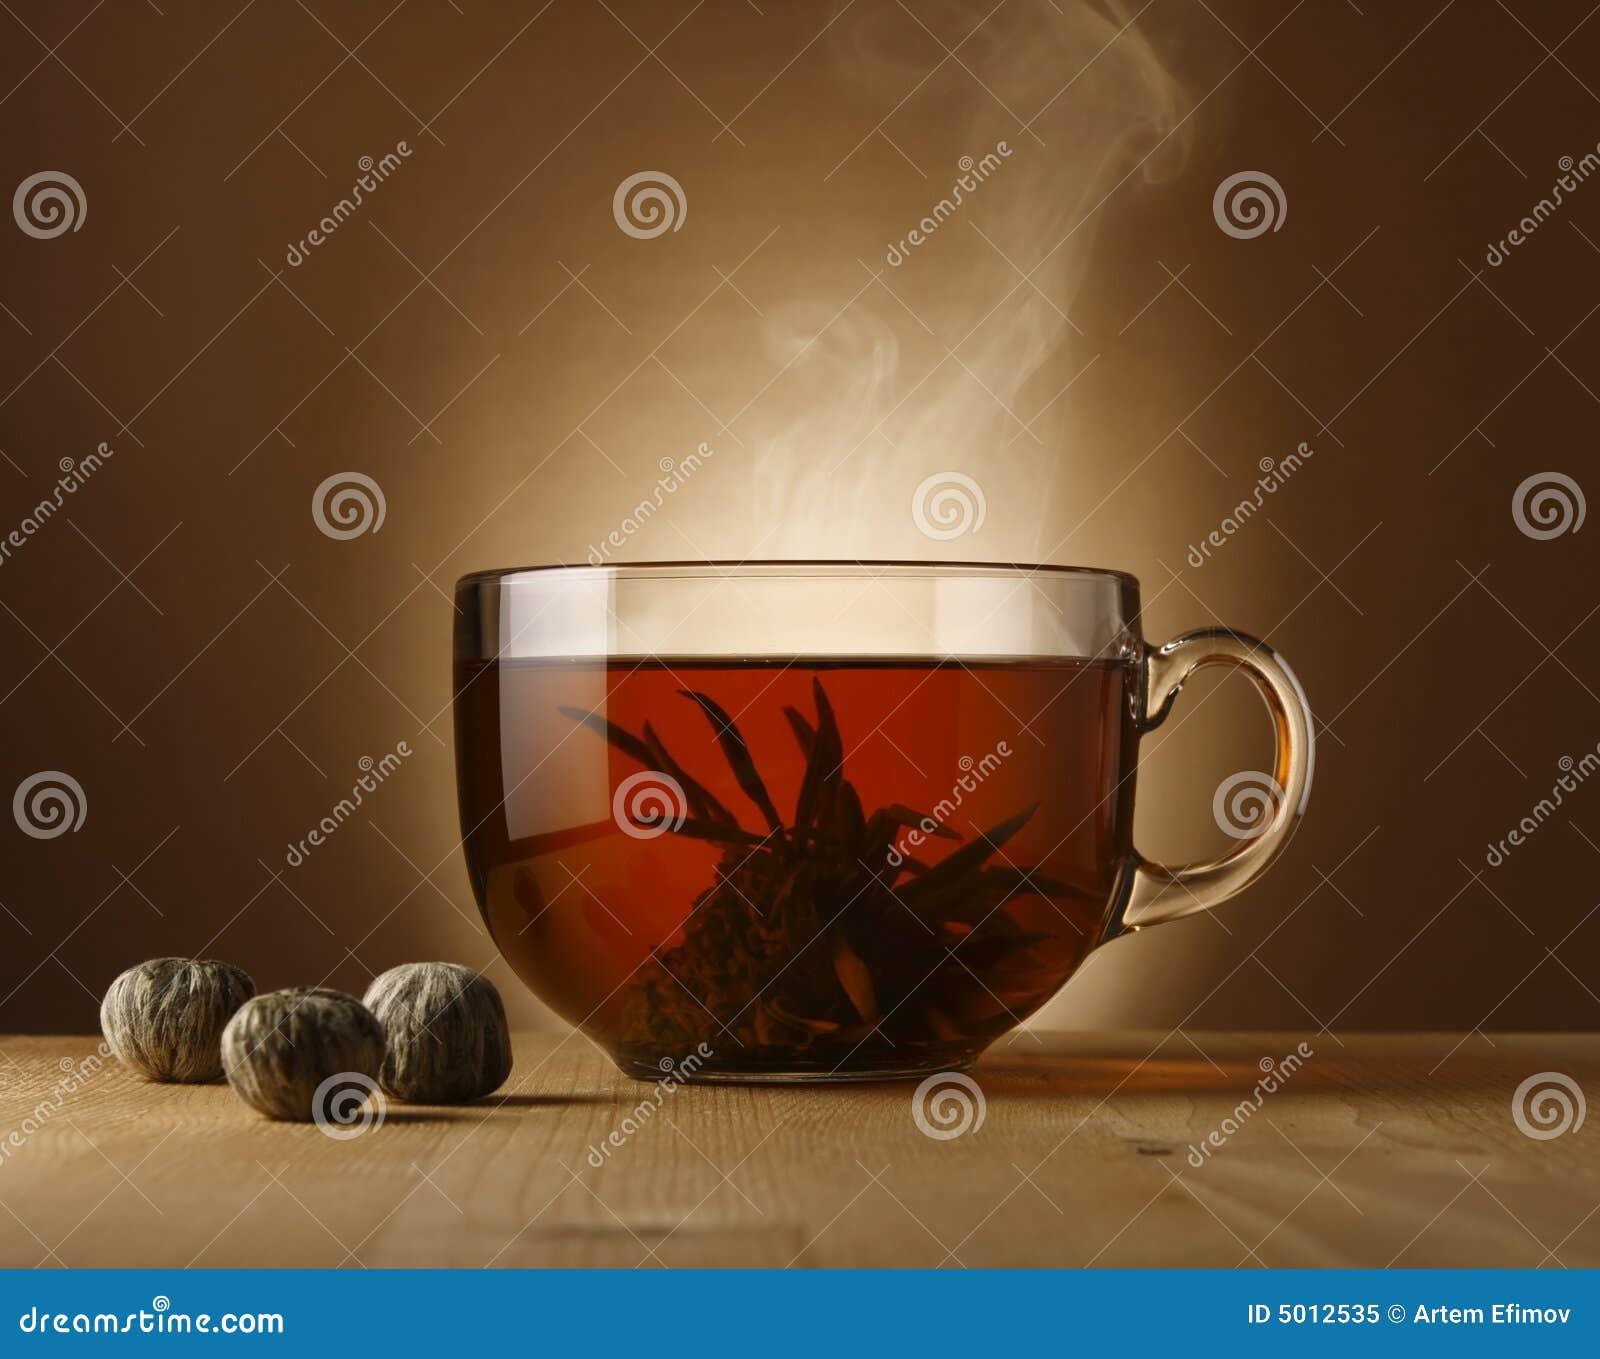 Tea bowl with Chinese tea